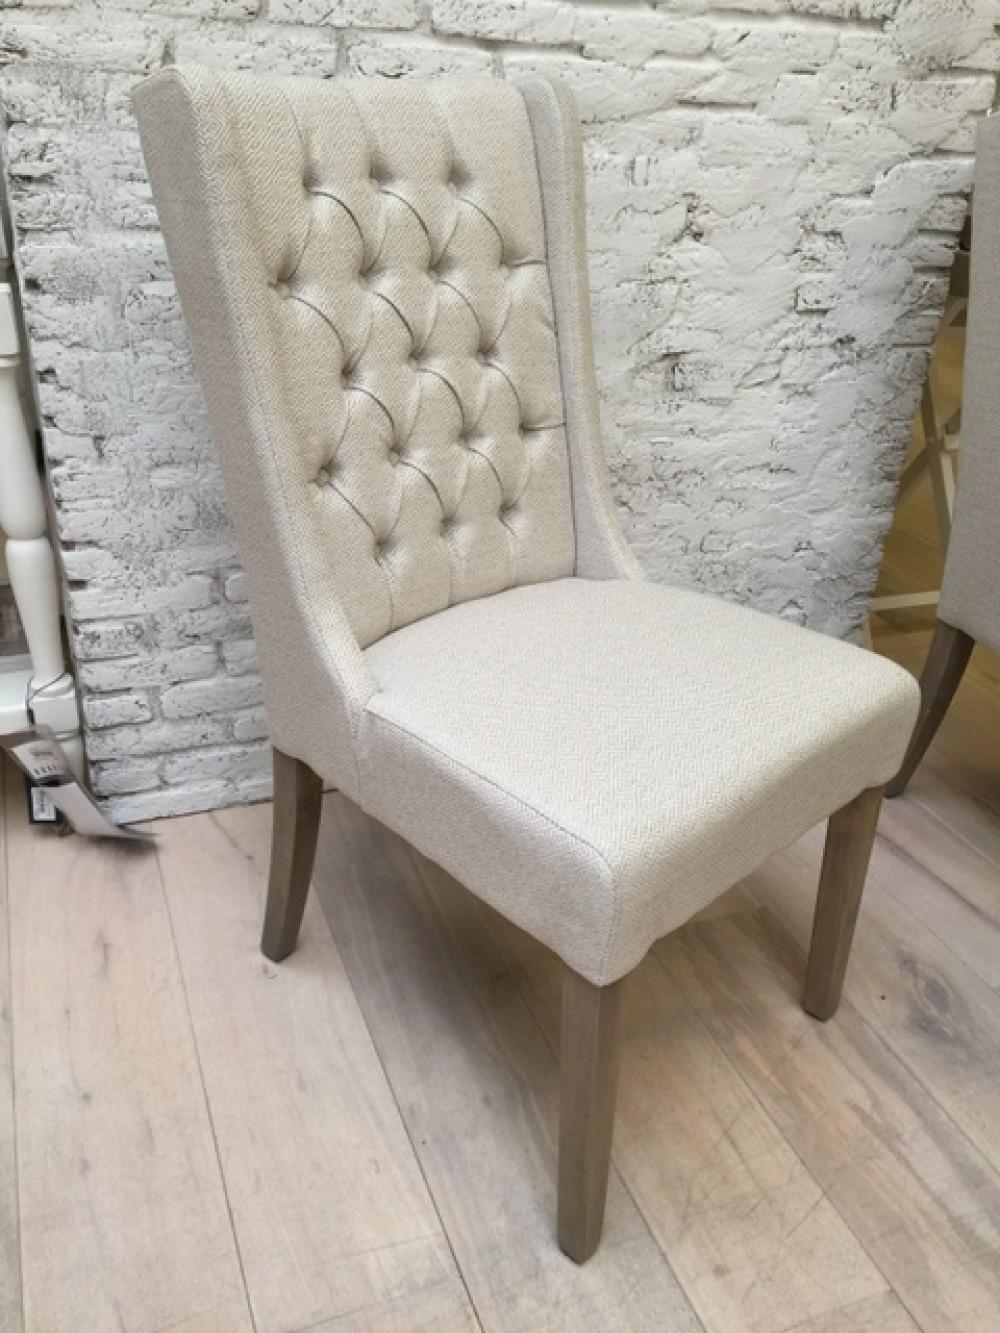 stuhl gepolstert landhaus stuhl creme silber gepolstert. Black Bedroom Furniture Sets. Home Design Ideas